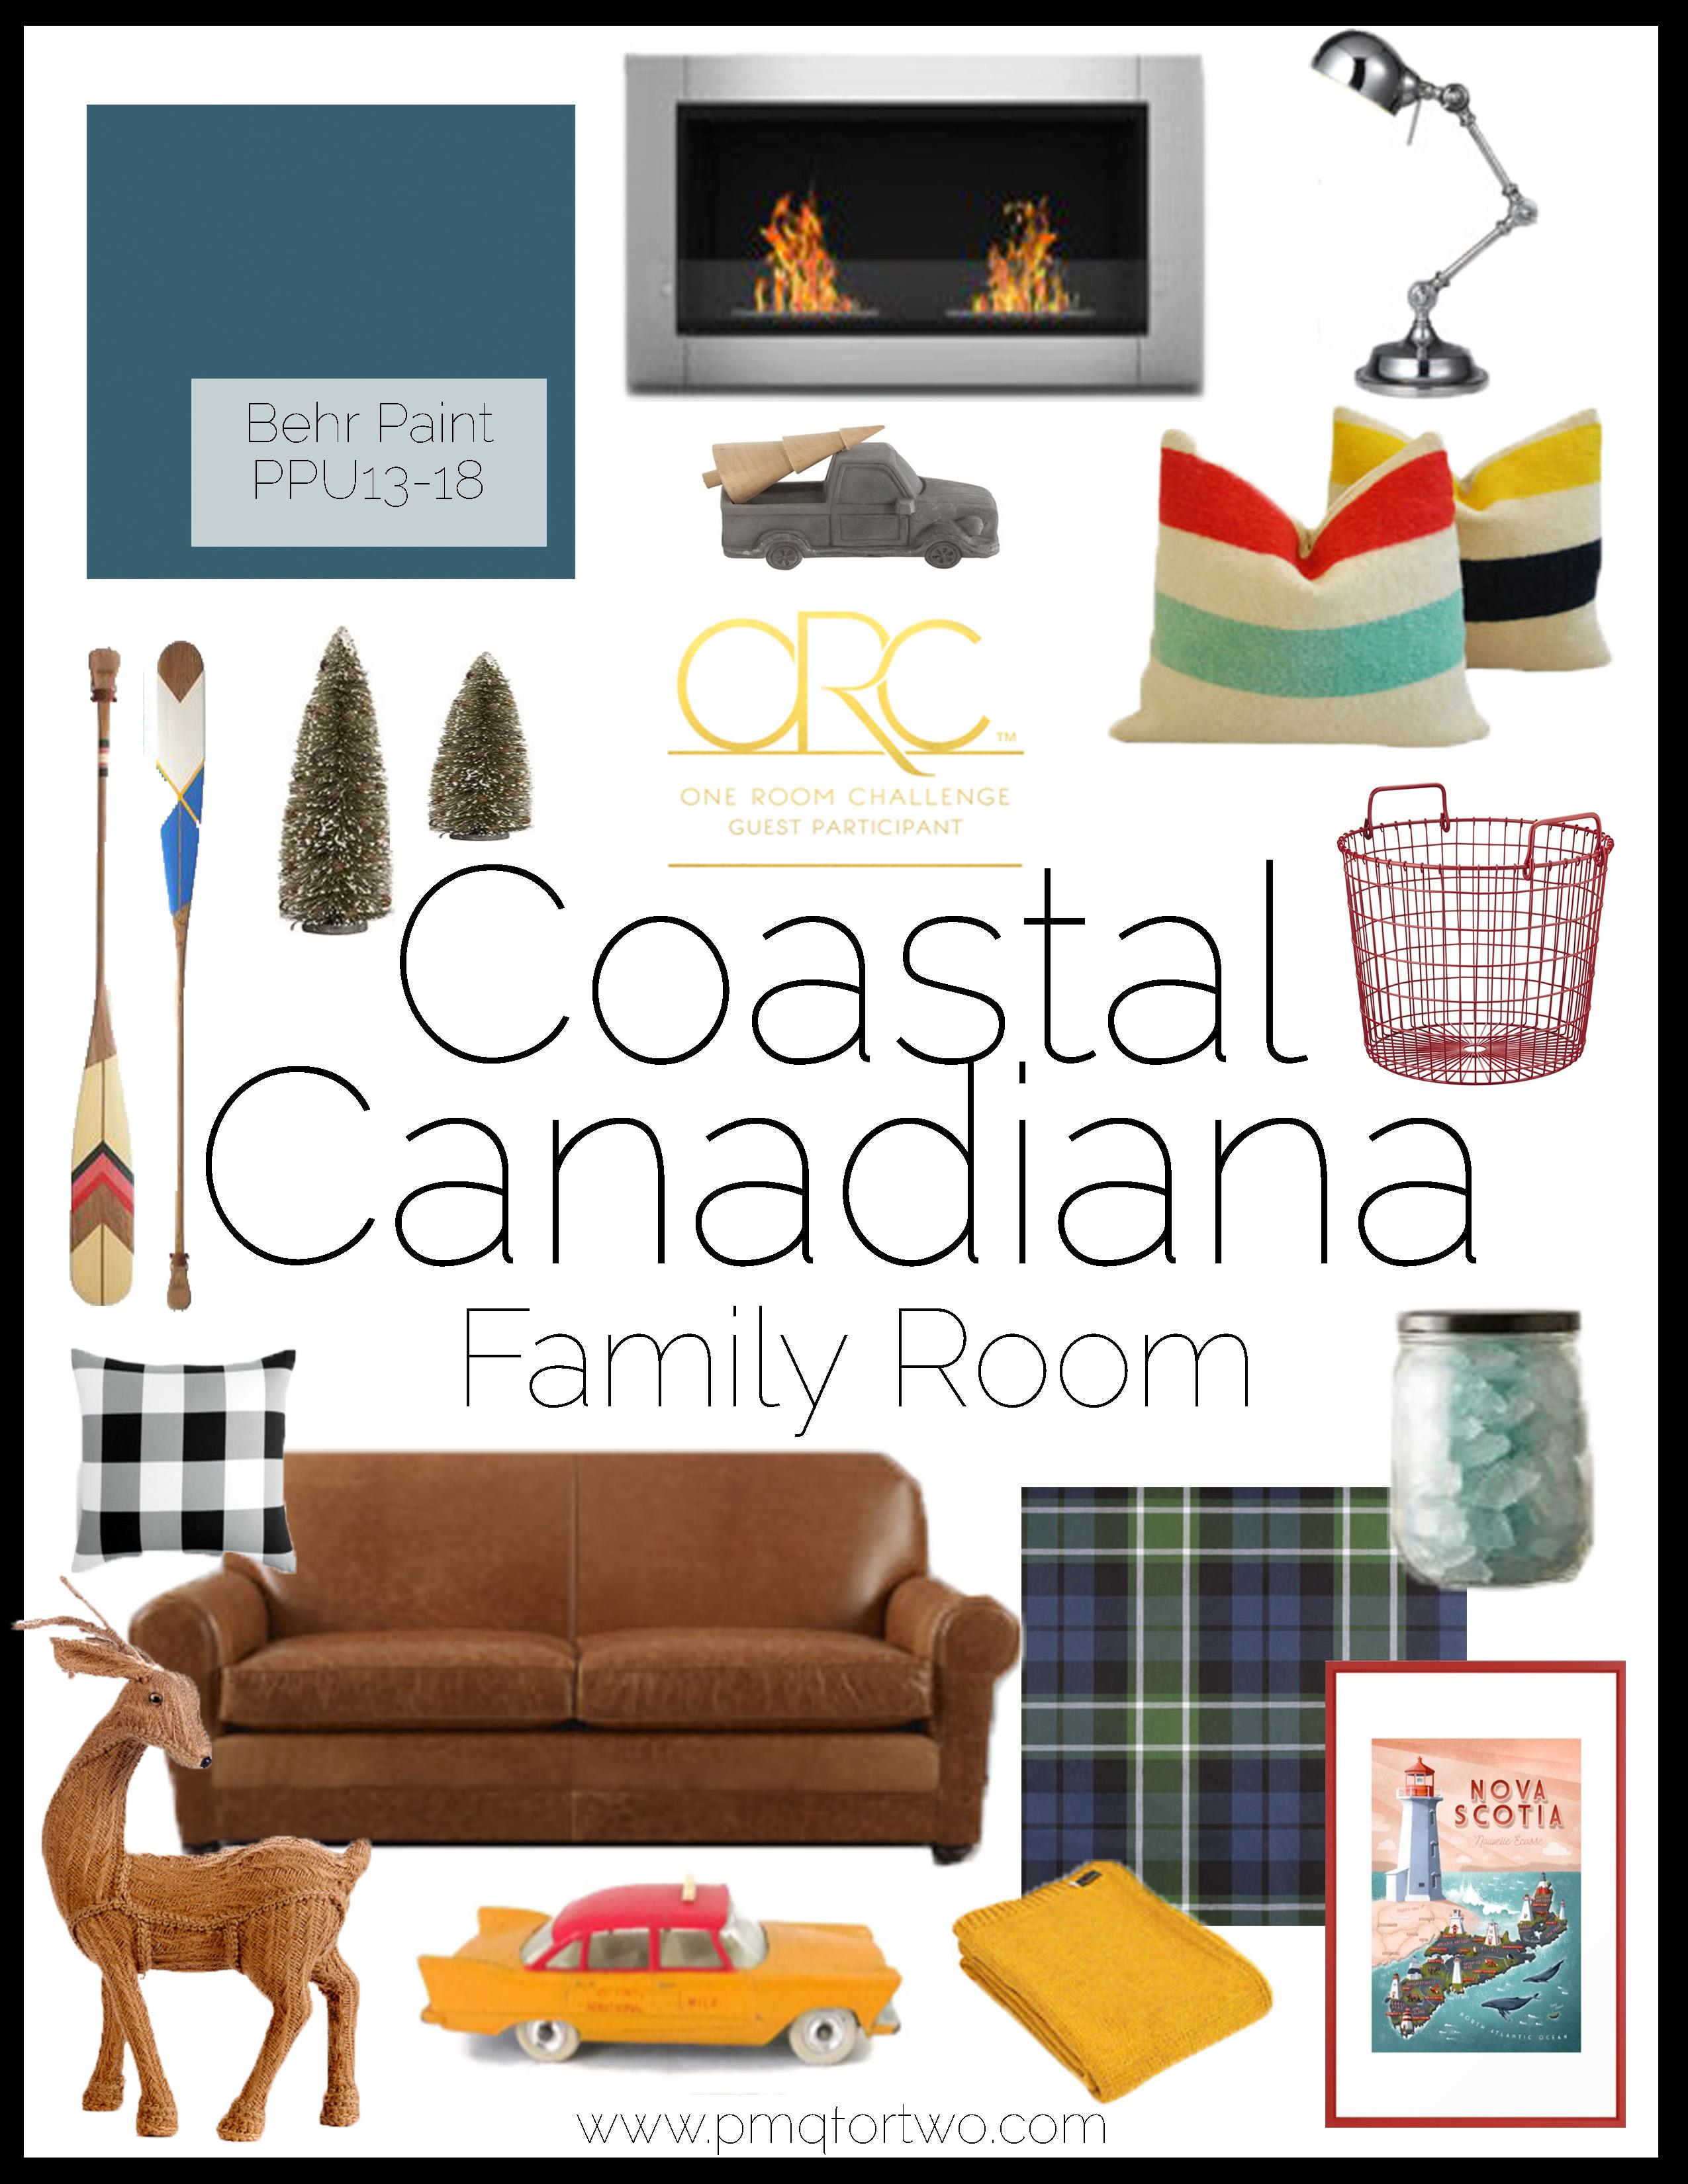 coastal-canadiana-one-room-challenge